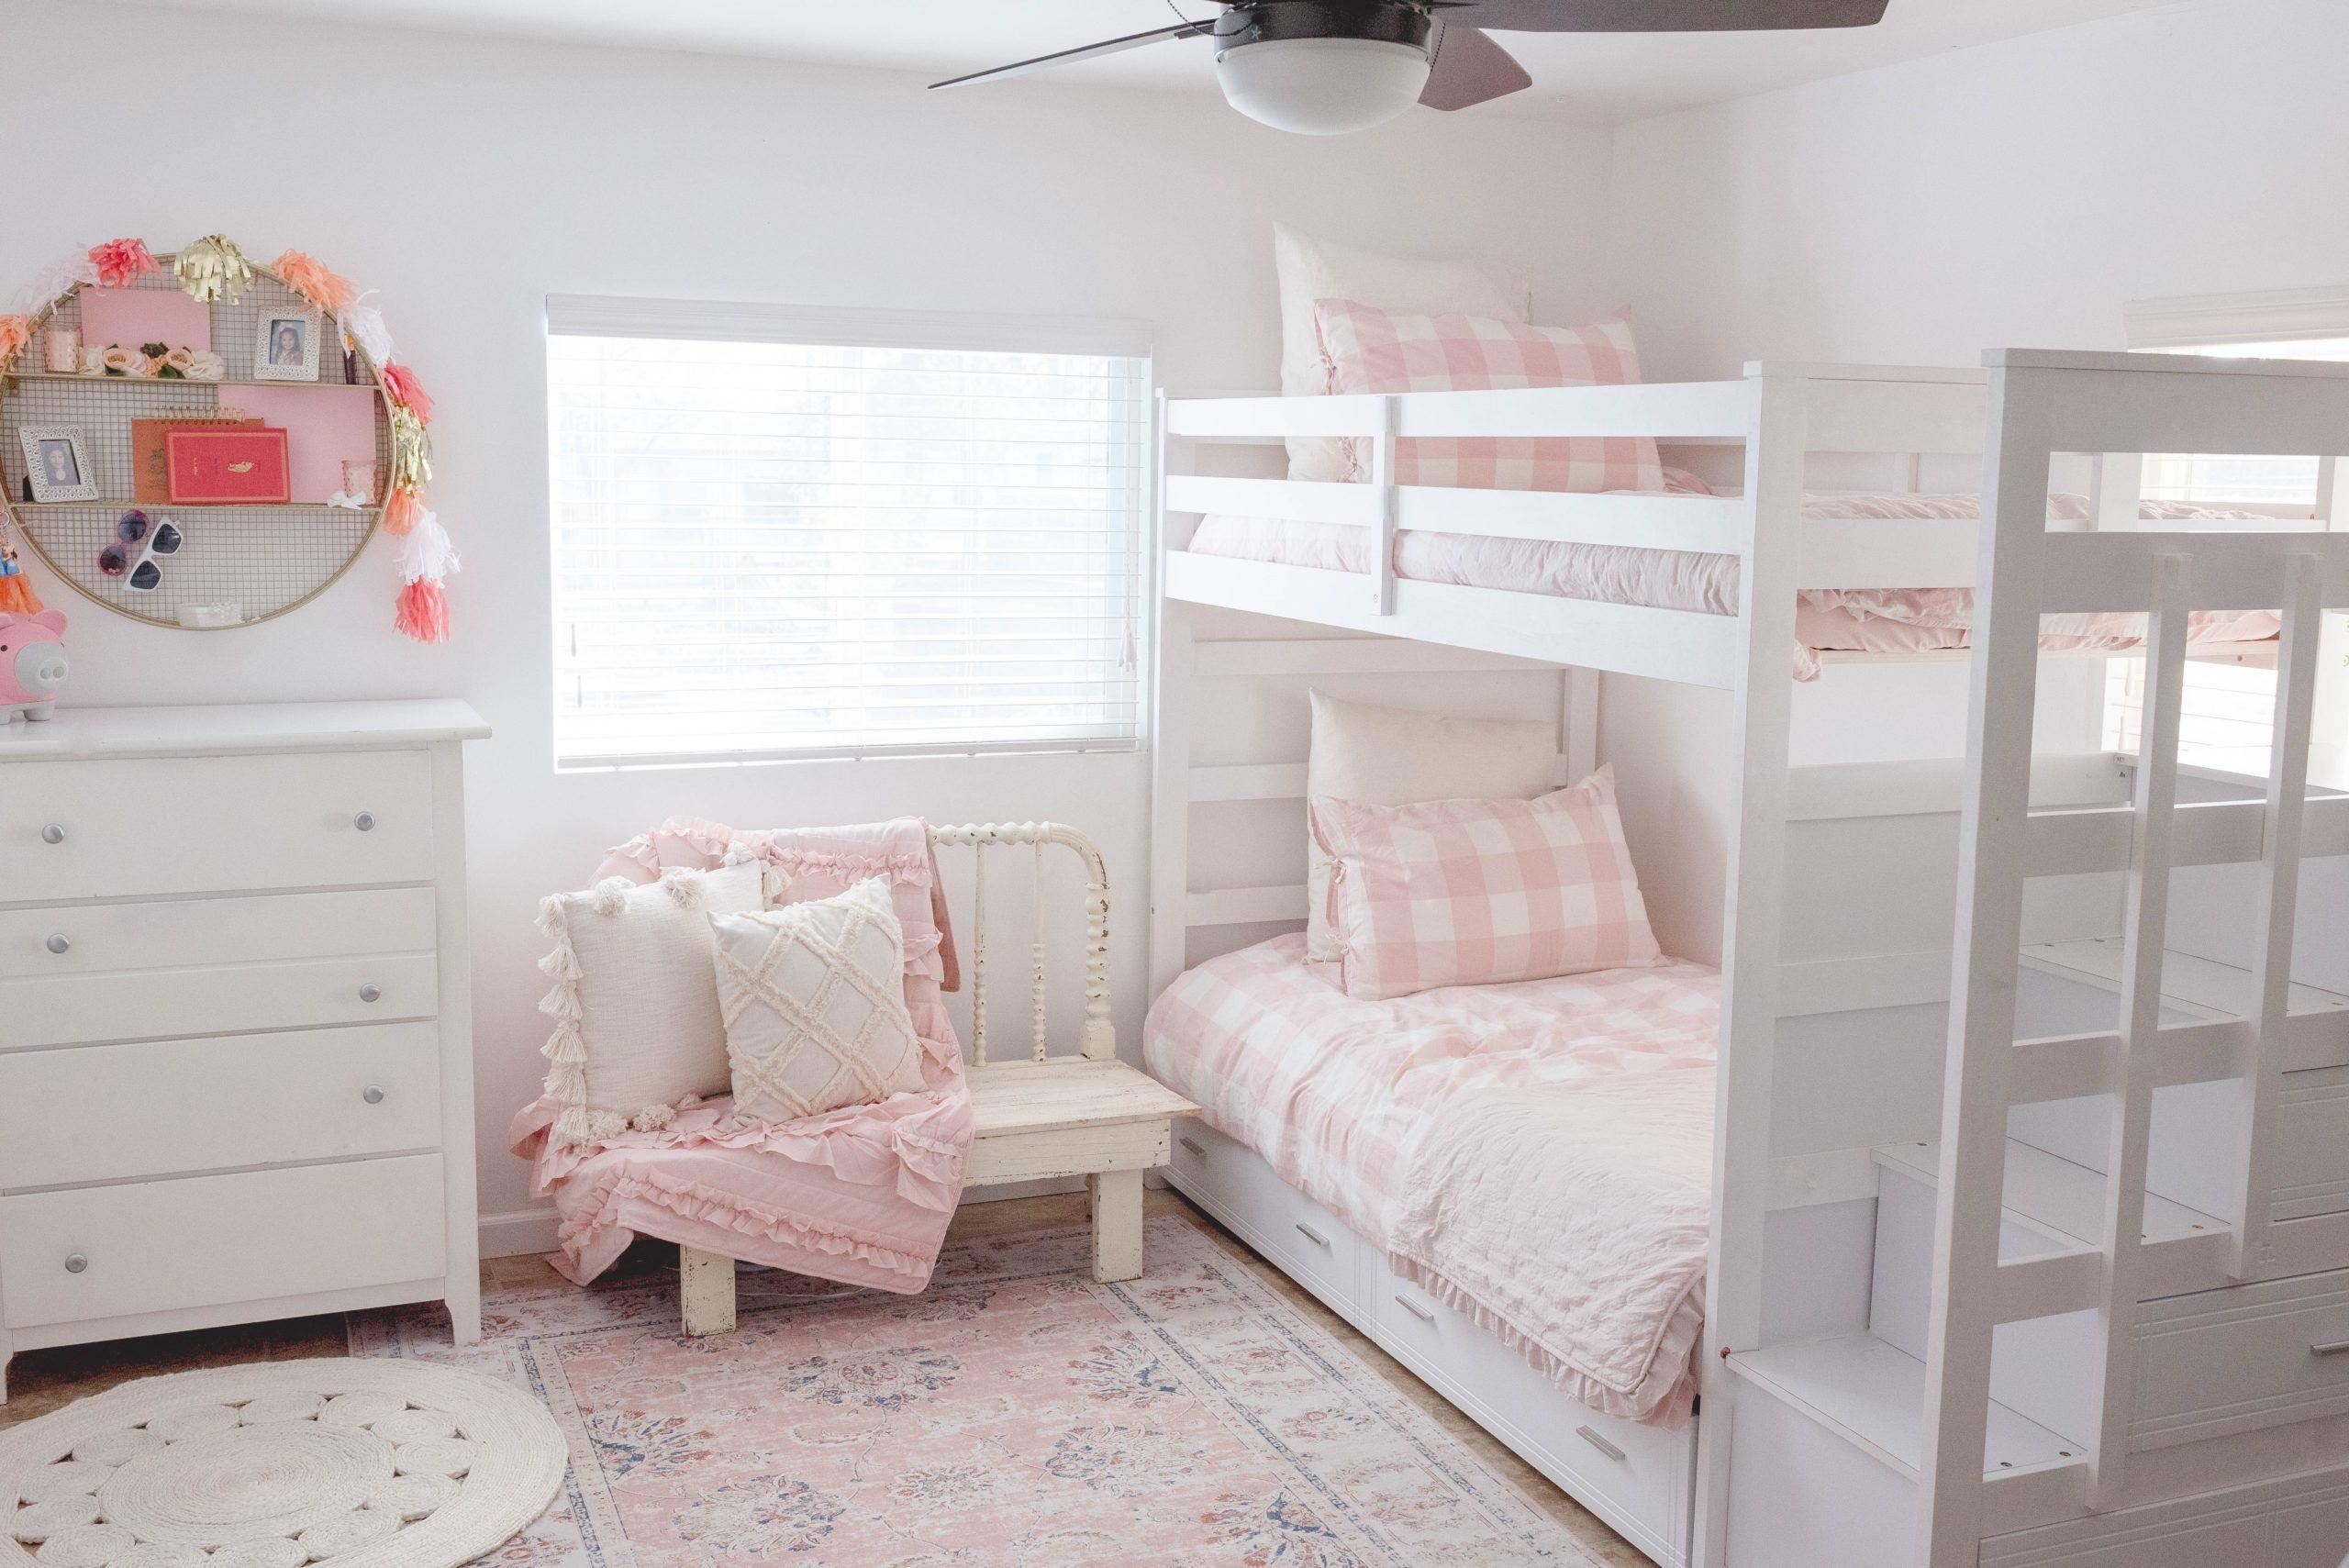 Dekorasi Kamar Tidur Anak Perempuan Nuansa Lembut